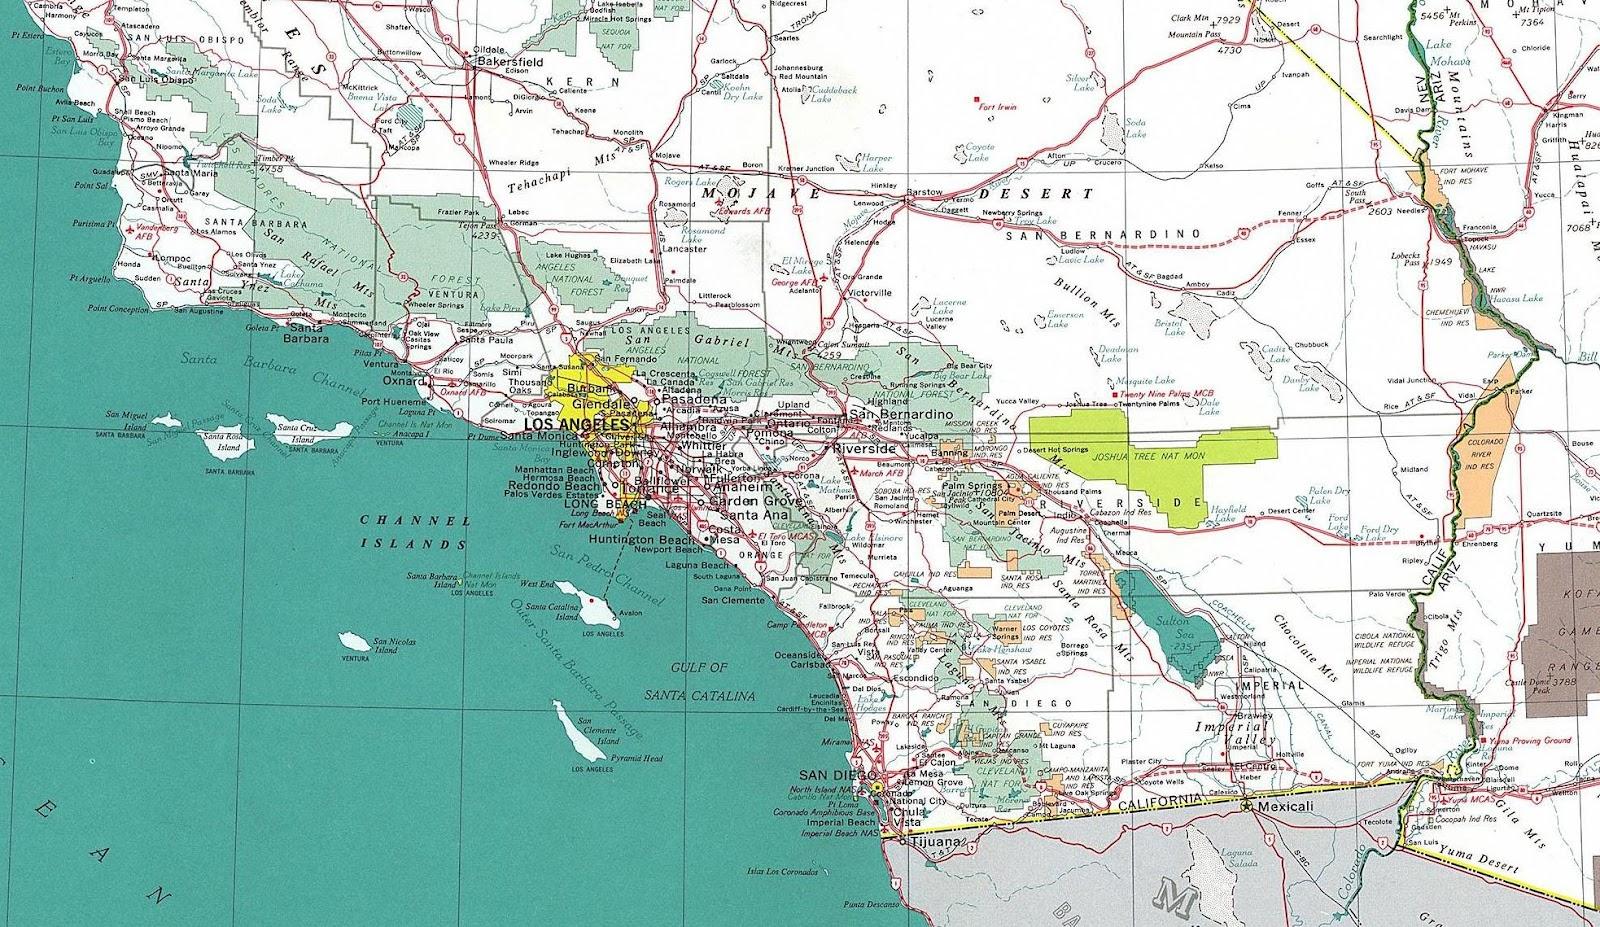 Southern California Road Map Google Maps California Southern - California Road Map Google